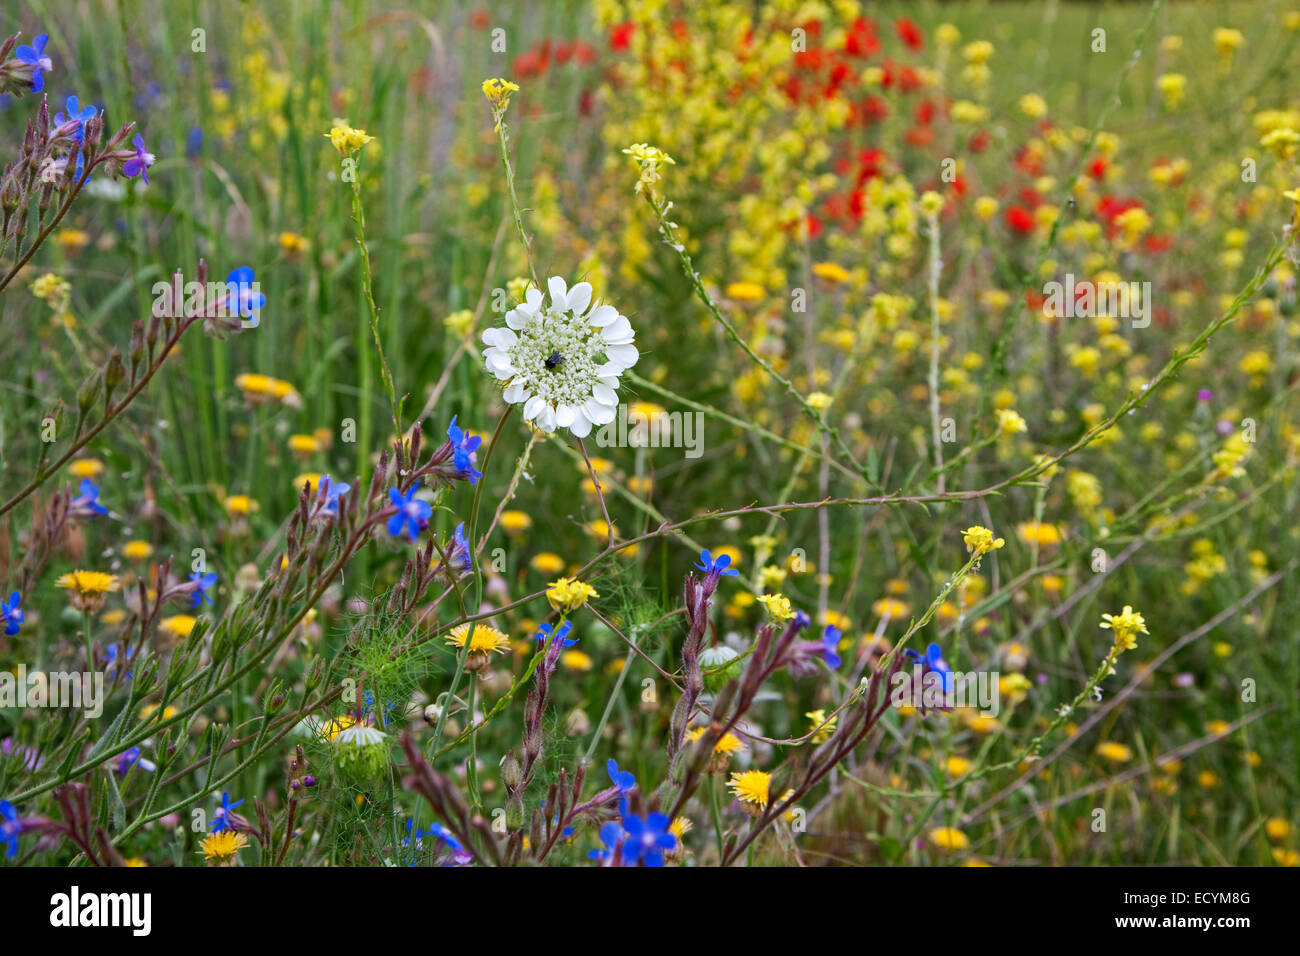 Colourful wildflowers flowering in meadow in spring, Turkey - Stock Image